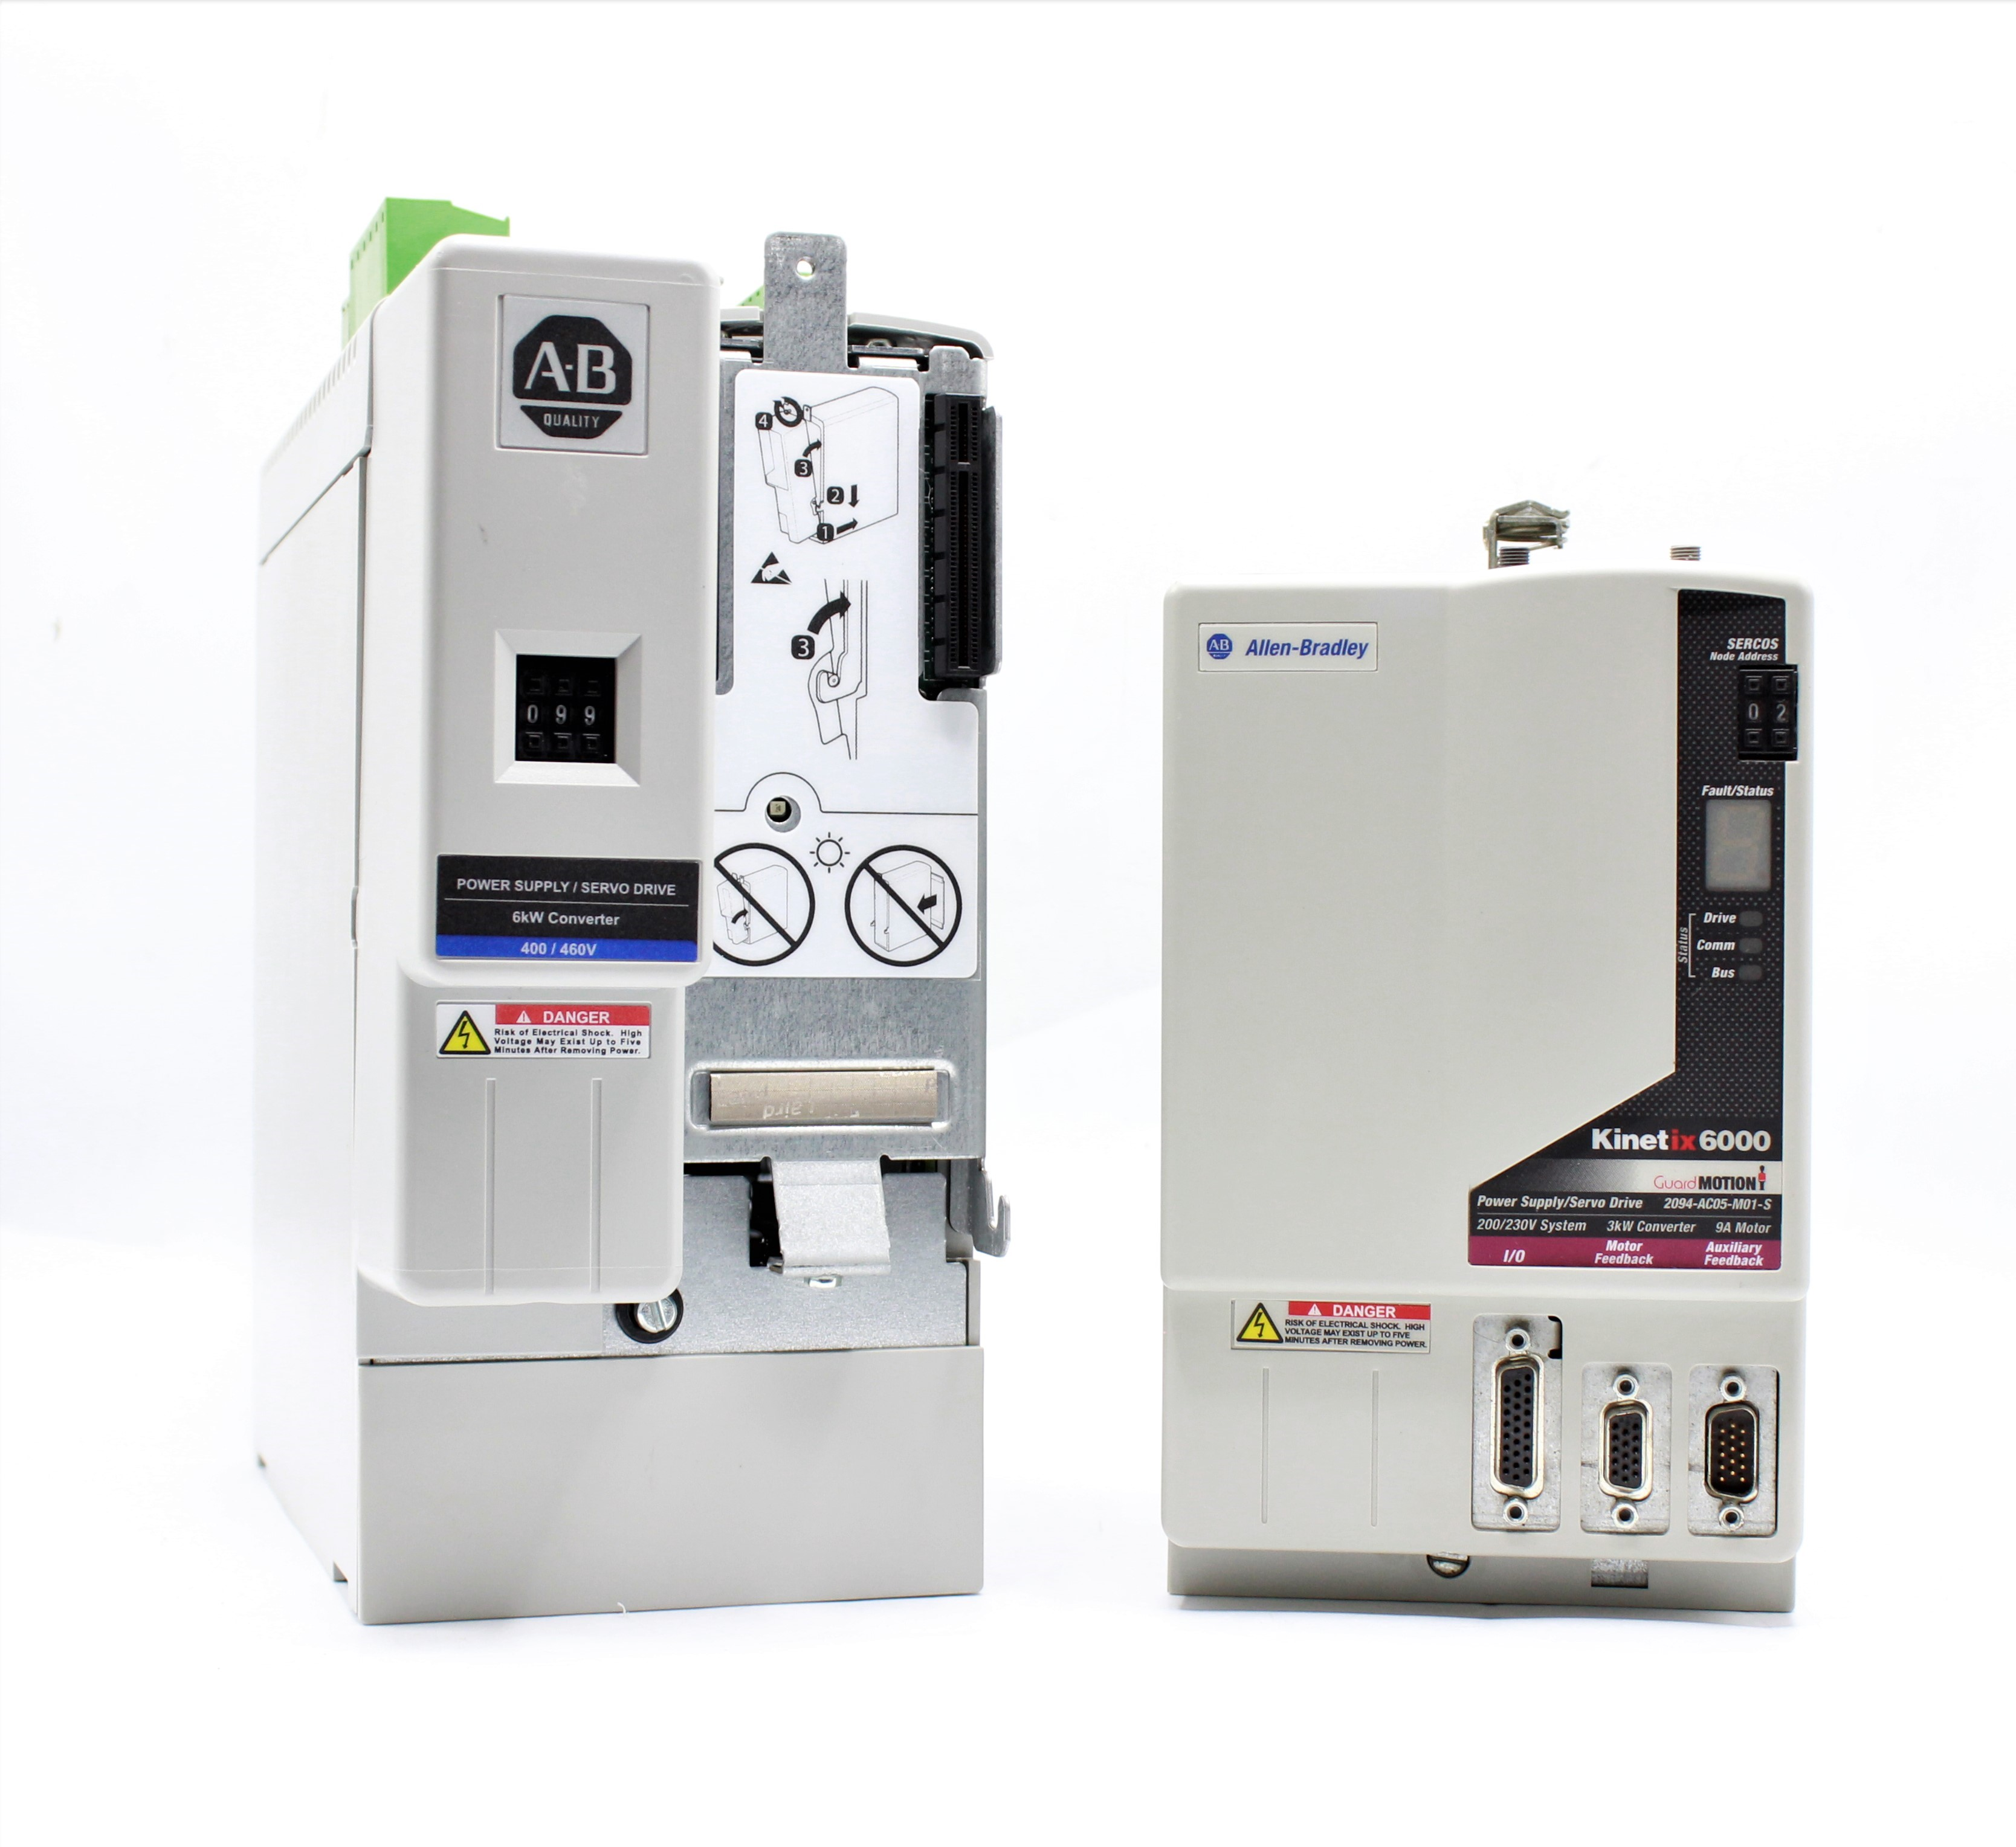 Hardware Comparison: Kinetix 6000 vs. 6200